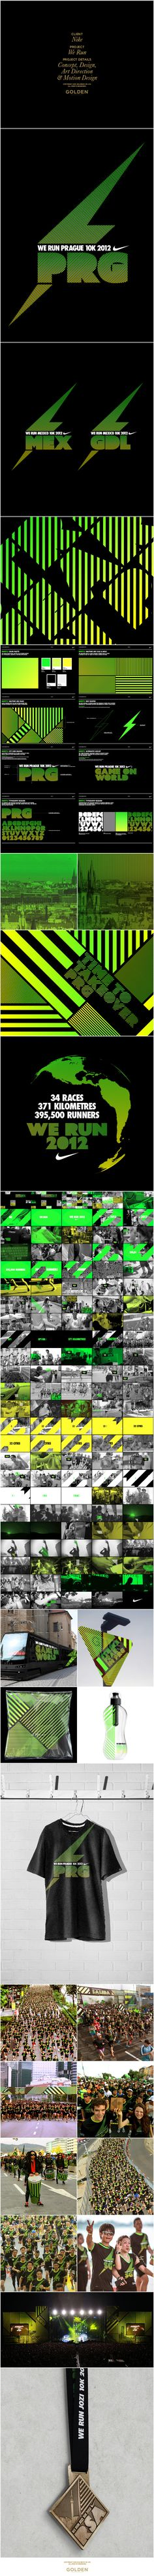 Nike We Run by Golden , via Behance